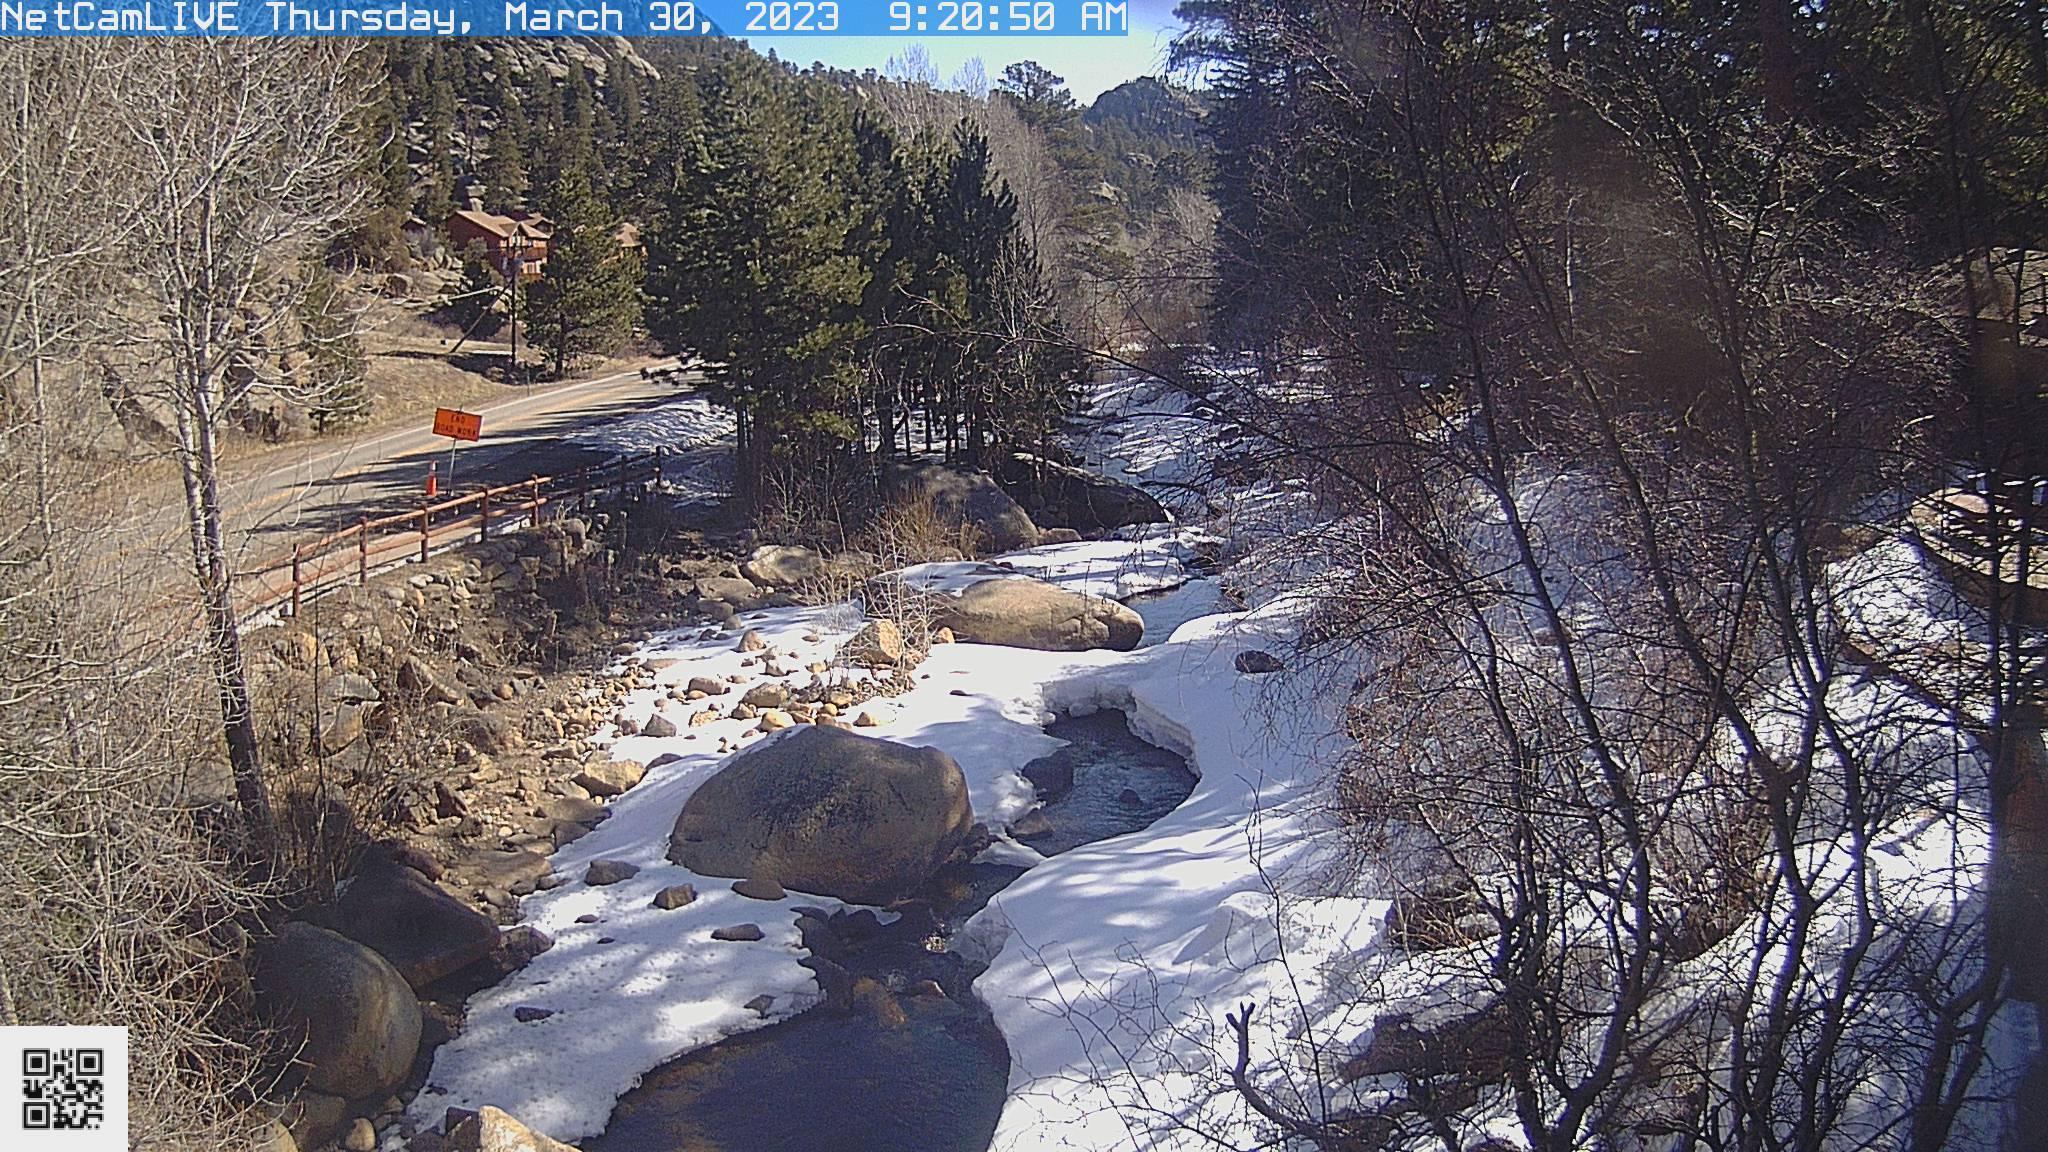 Estes Park Webcam